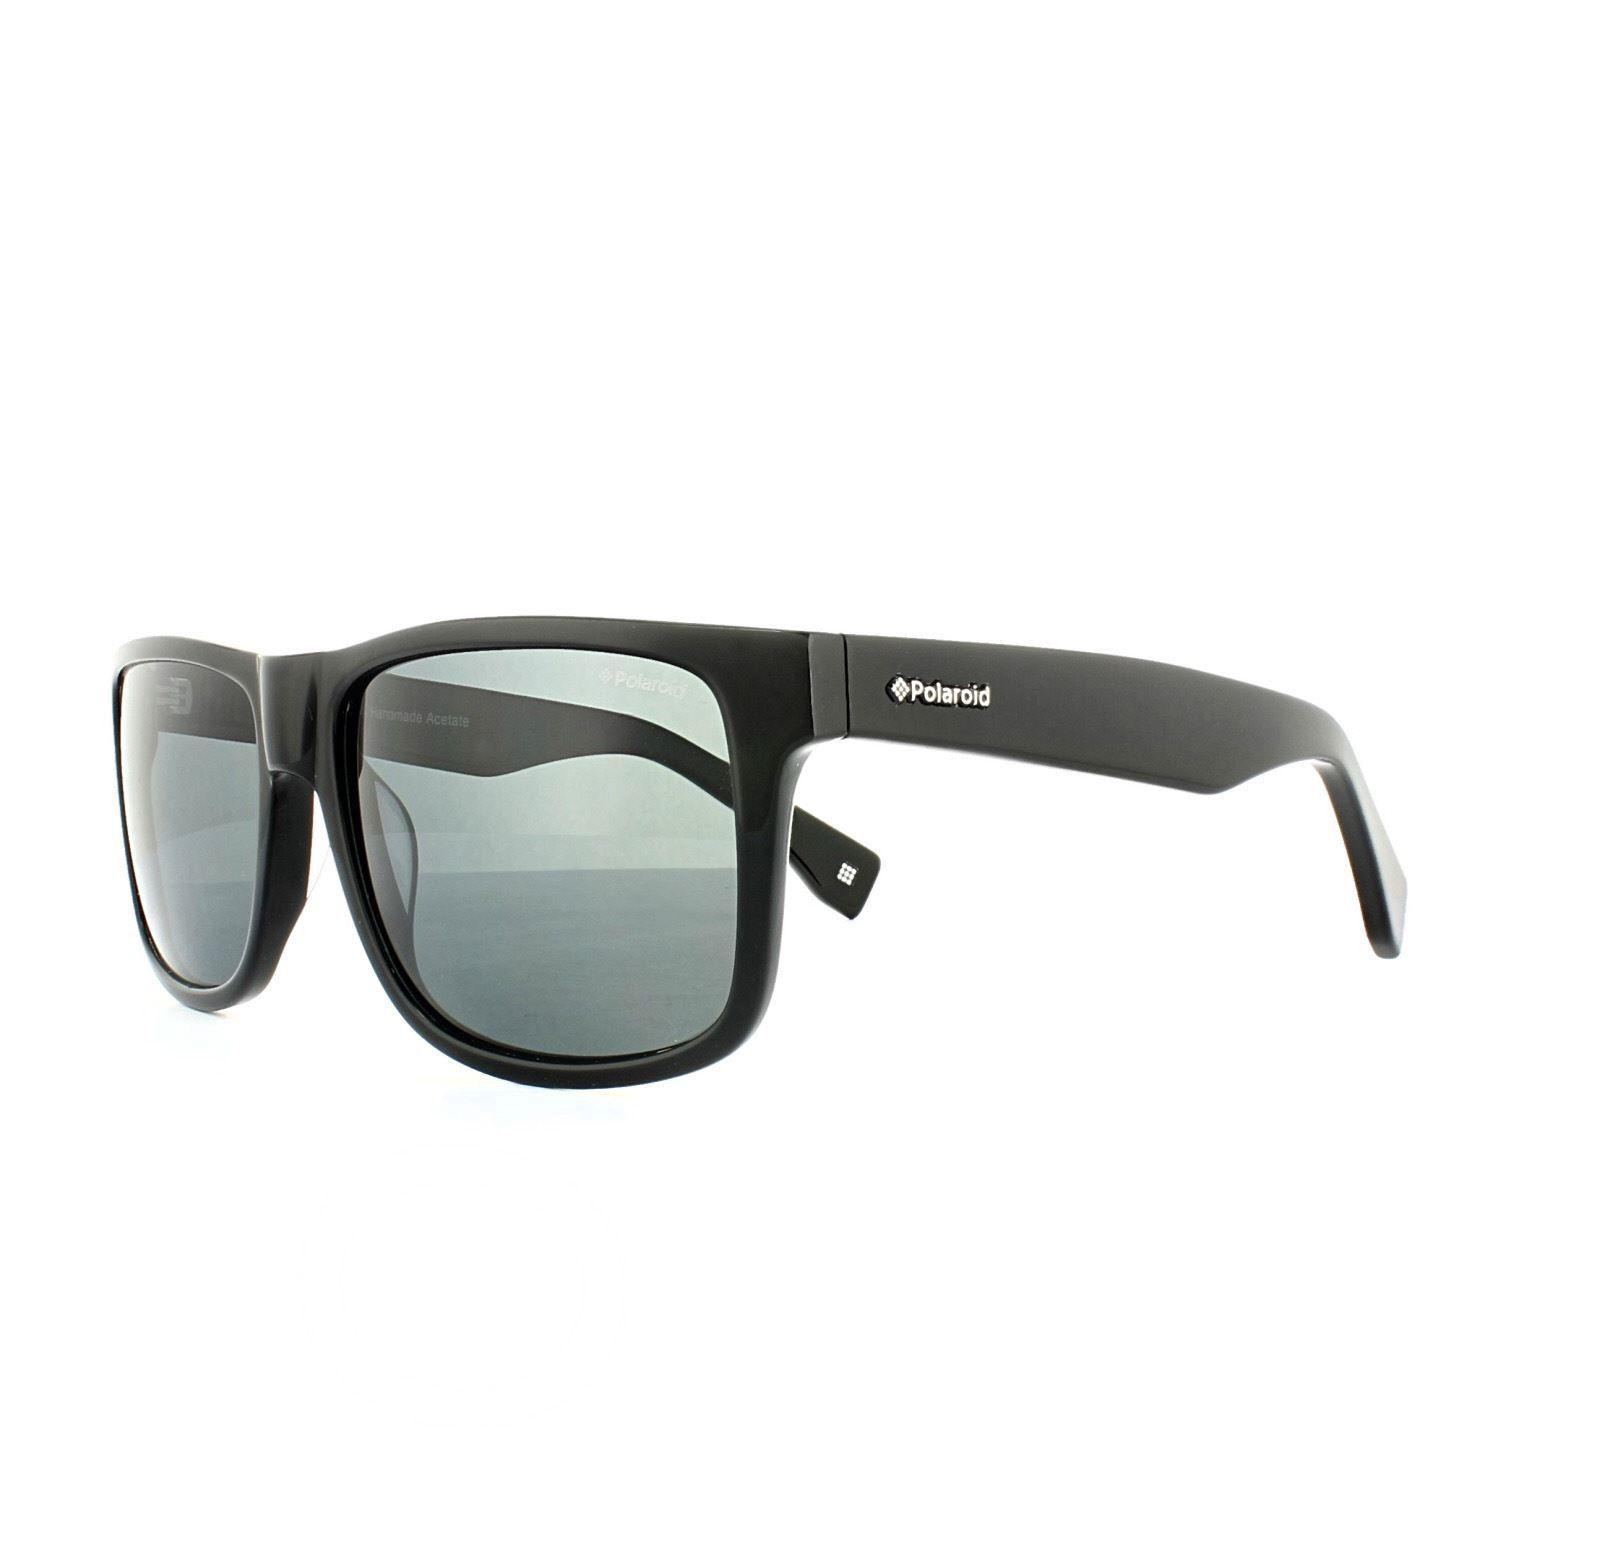 Polaroid Premium Sunglasses PLD 1001-S 807 Y2 Black Grey Polarized